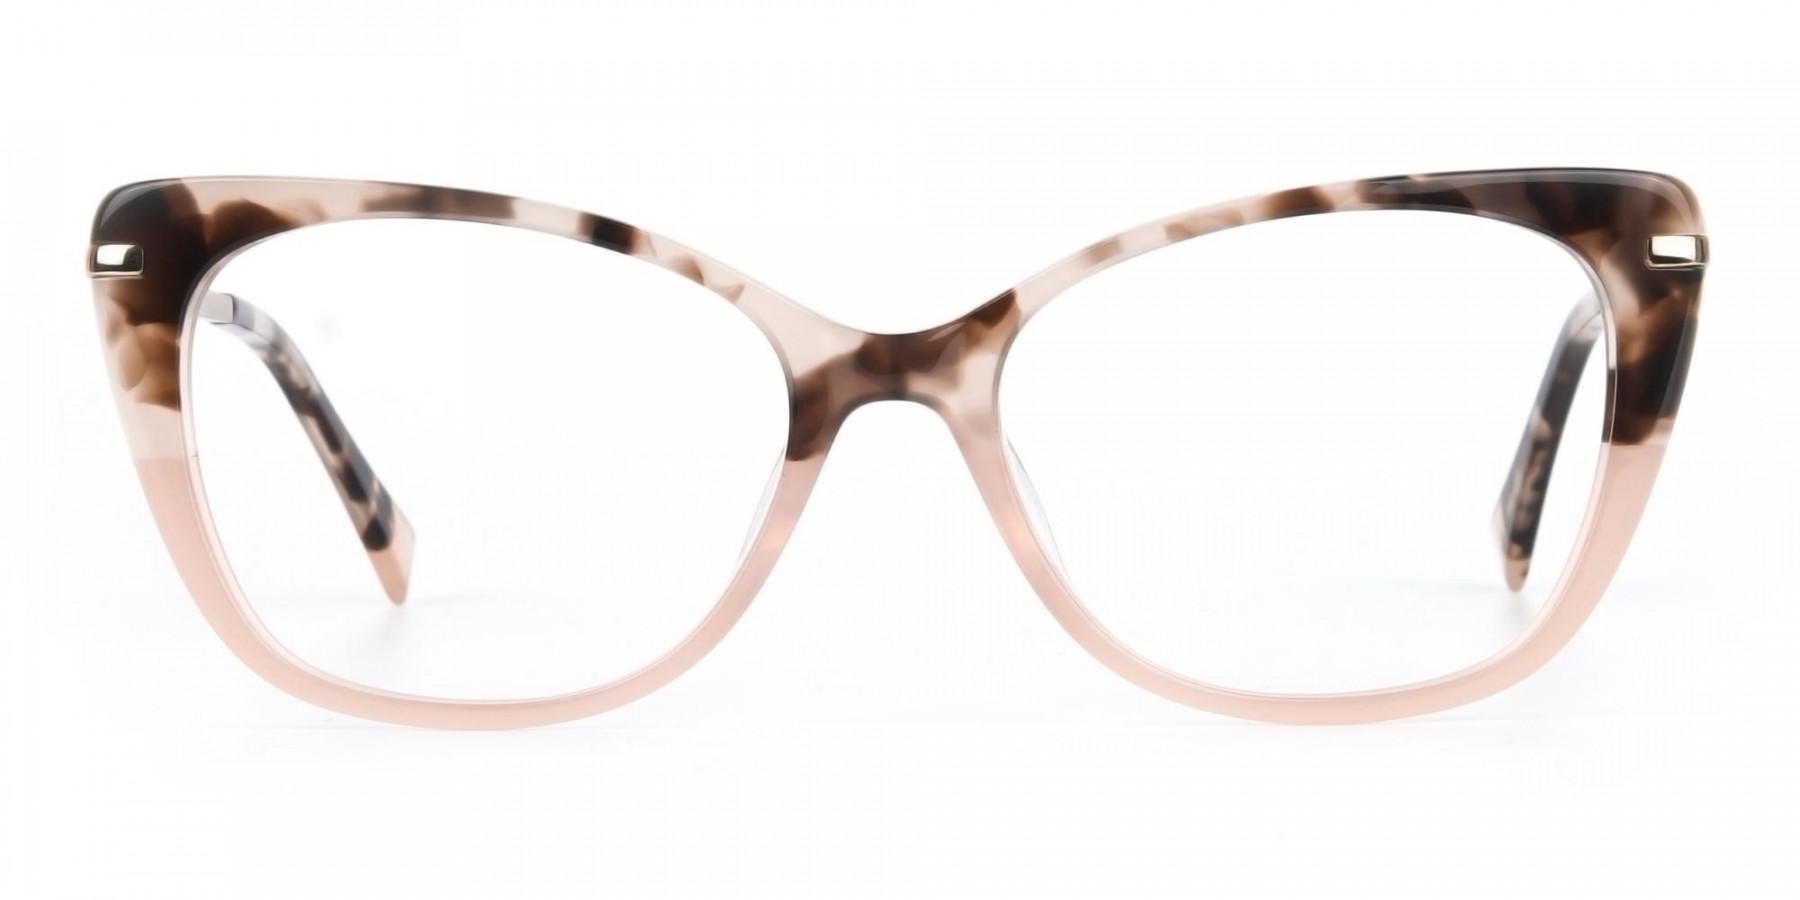 Brown Tortoise Eyeglasses Wayfarer & Cat-eye-1